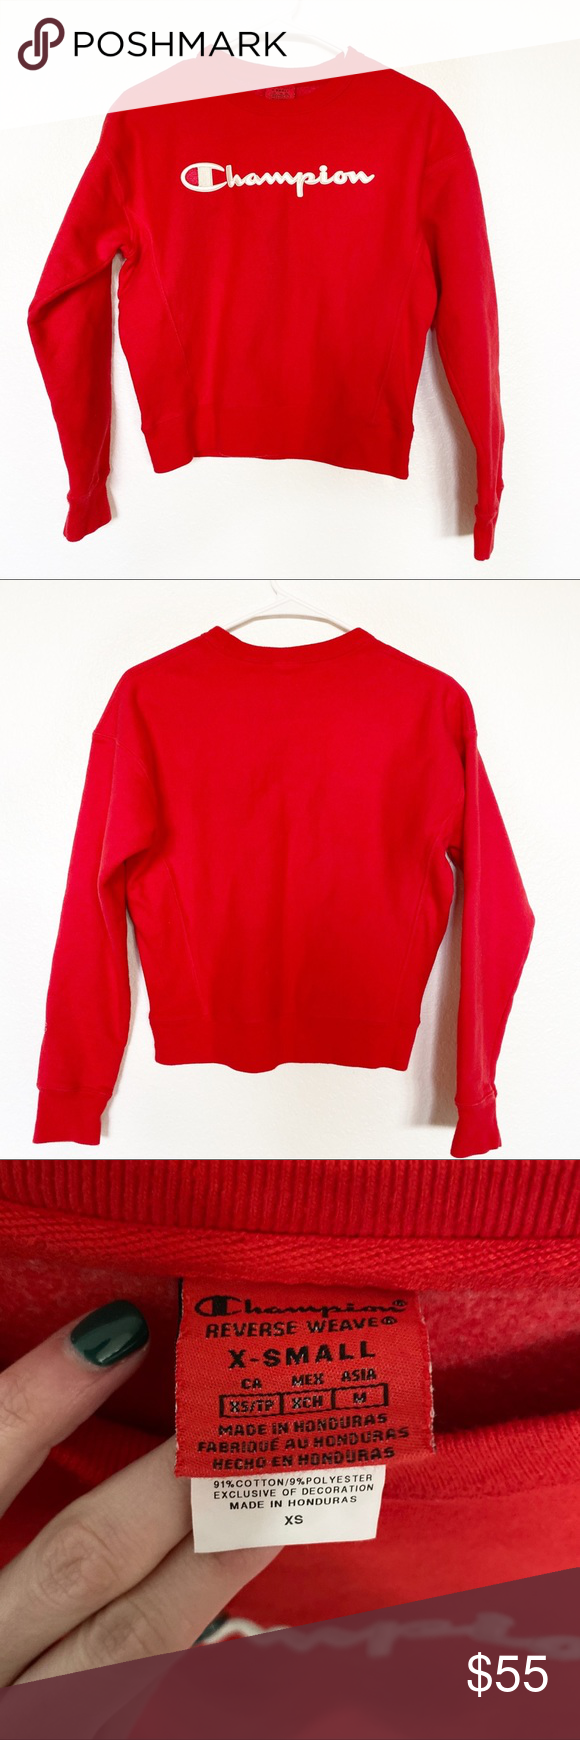 Champion Reverse Weave Script Sweatshirt Red Champion Reverse Weave Sweatshirts Sweatshirt Tops [ 1740 x 580 Pixel ]